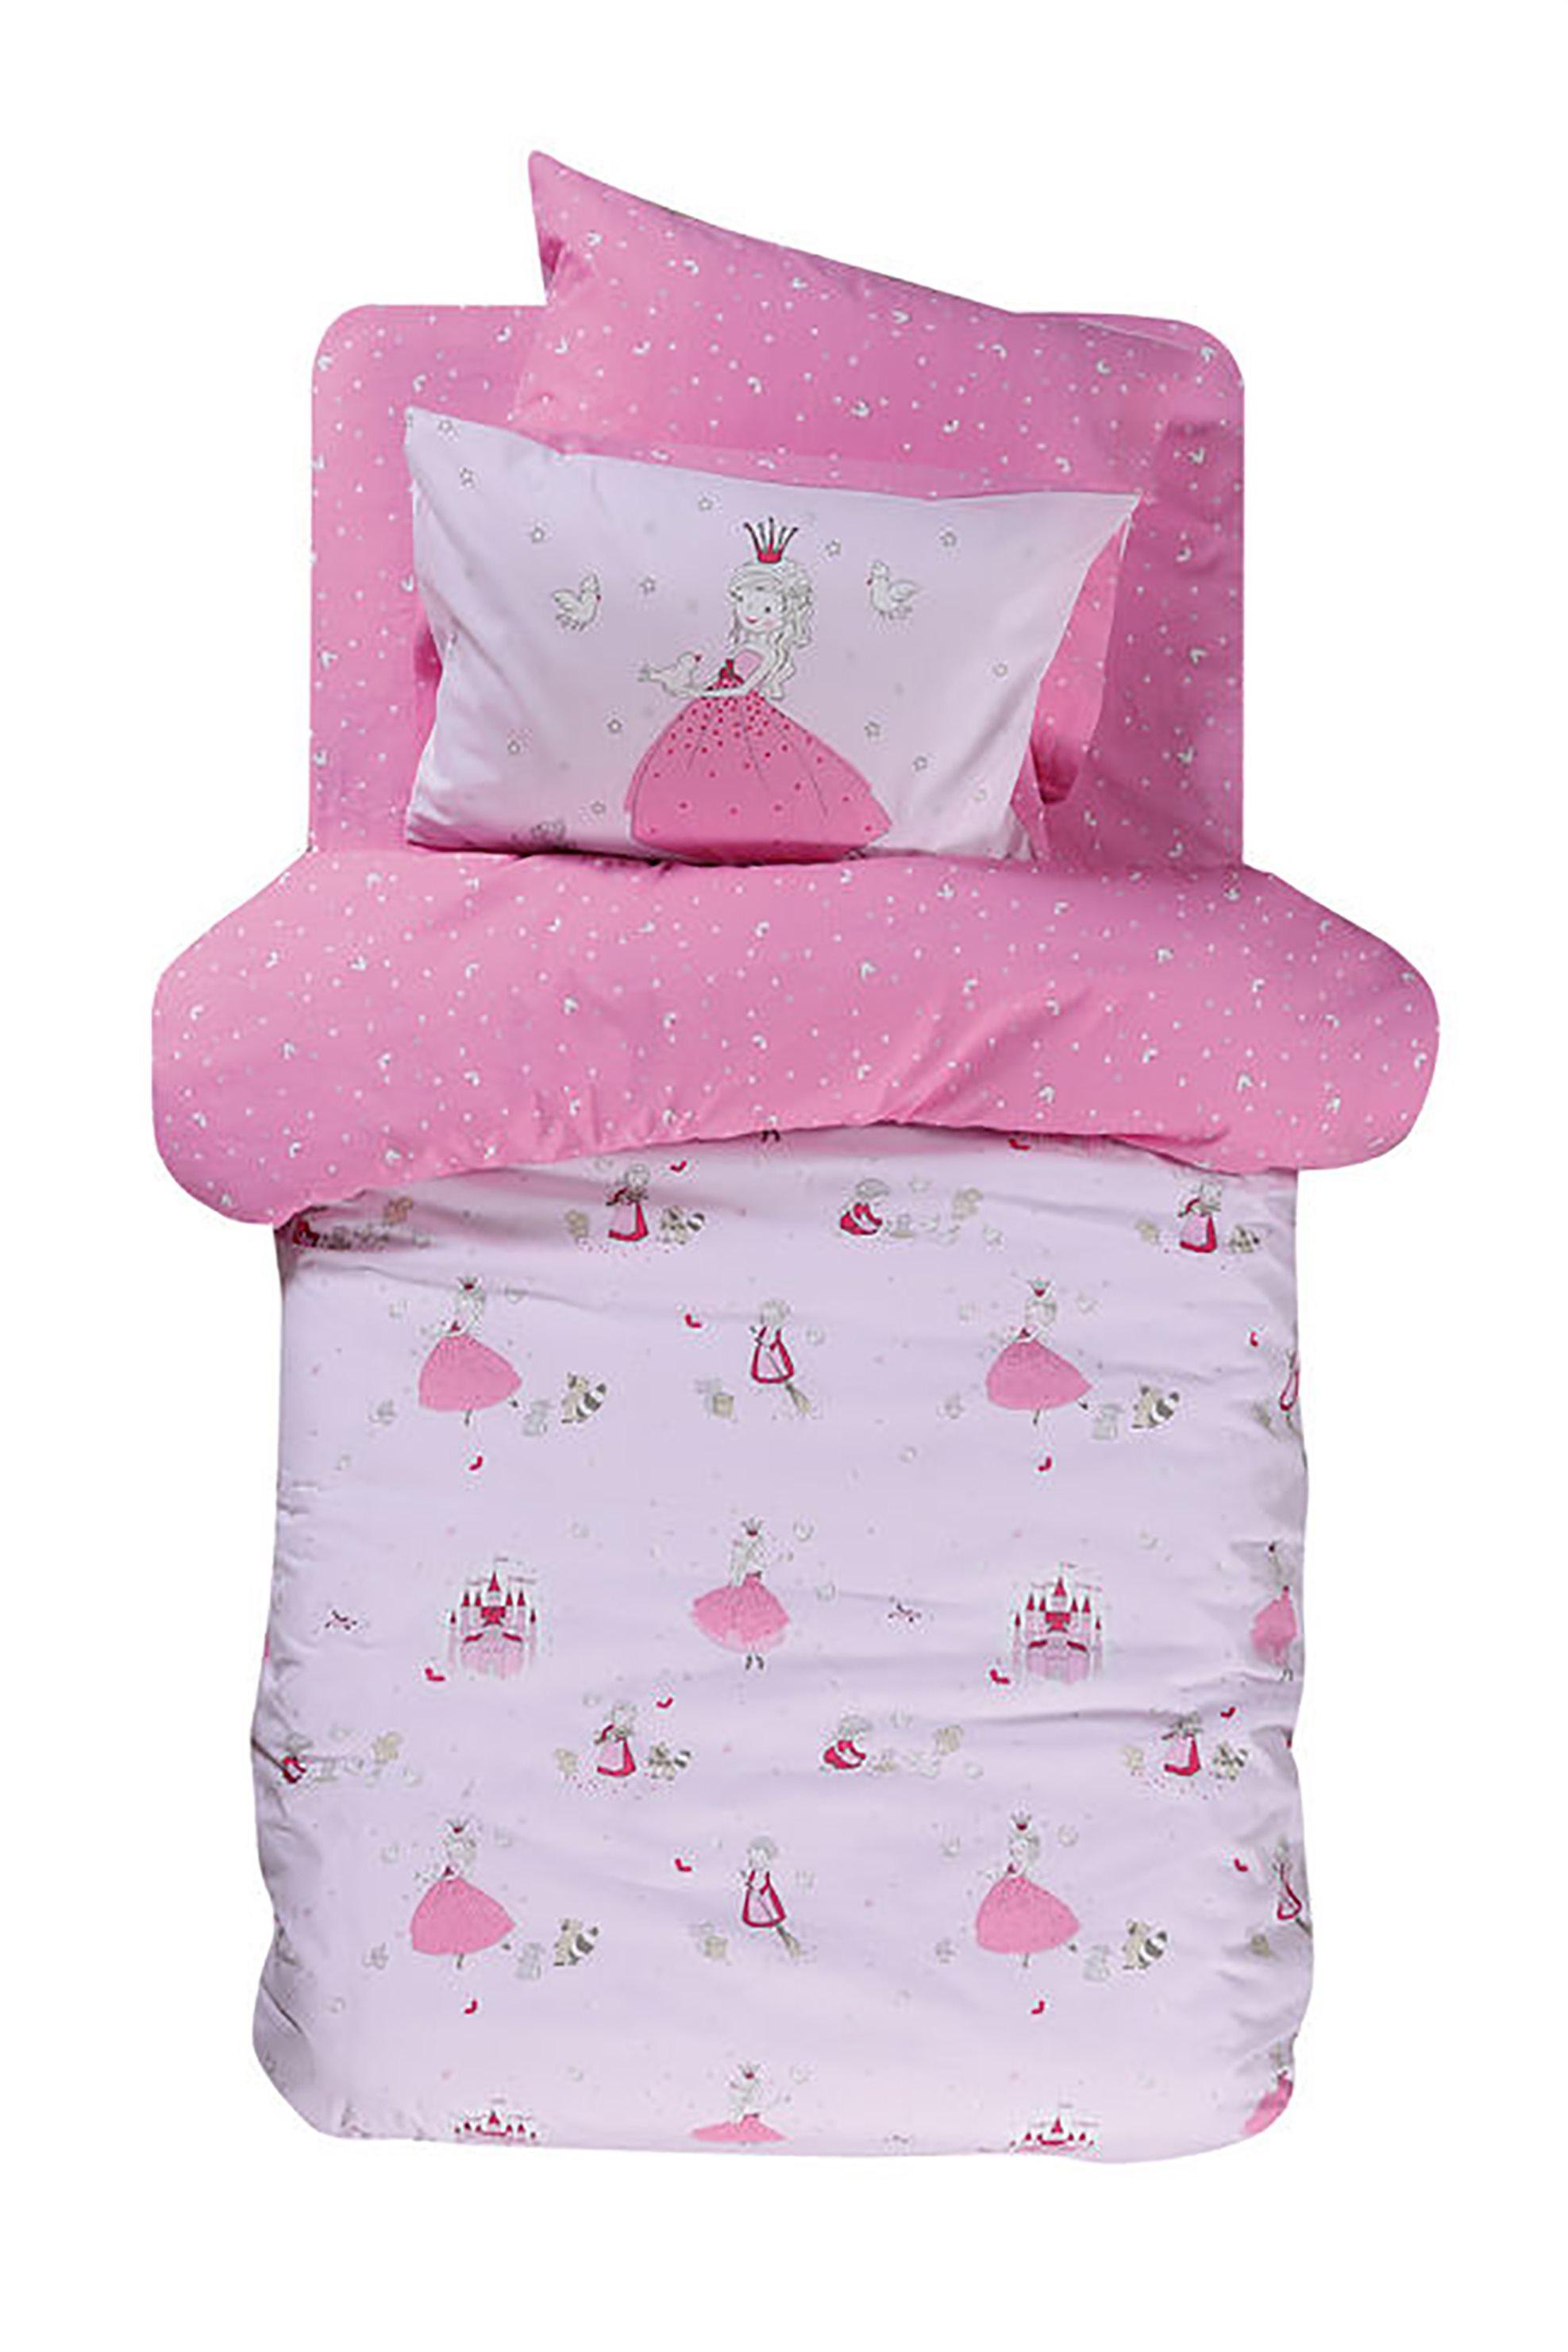 NEF-NEF Σετ παιδική παπλωματοθήκη ροζ A Dream Comes True (2 τεμάχια)  - 022274  home   παιδια   παπλωματοθήκες   σετ παιδικές παπλωματοθήκες